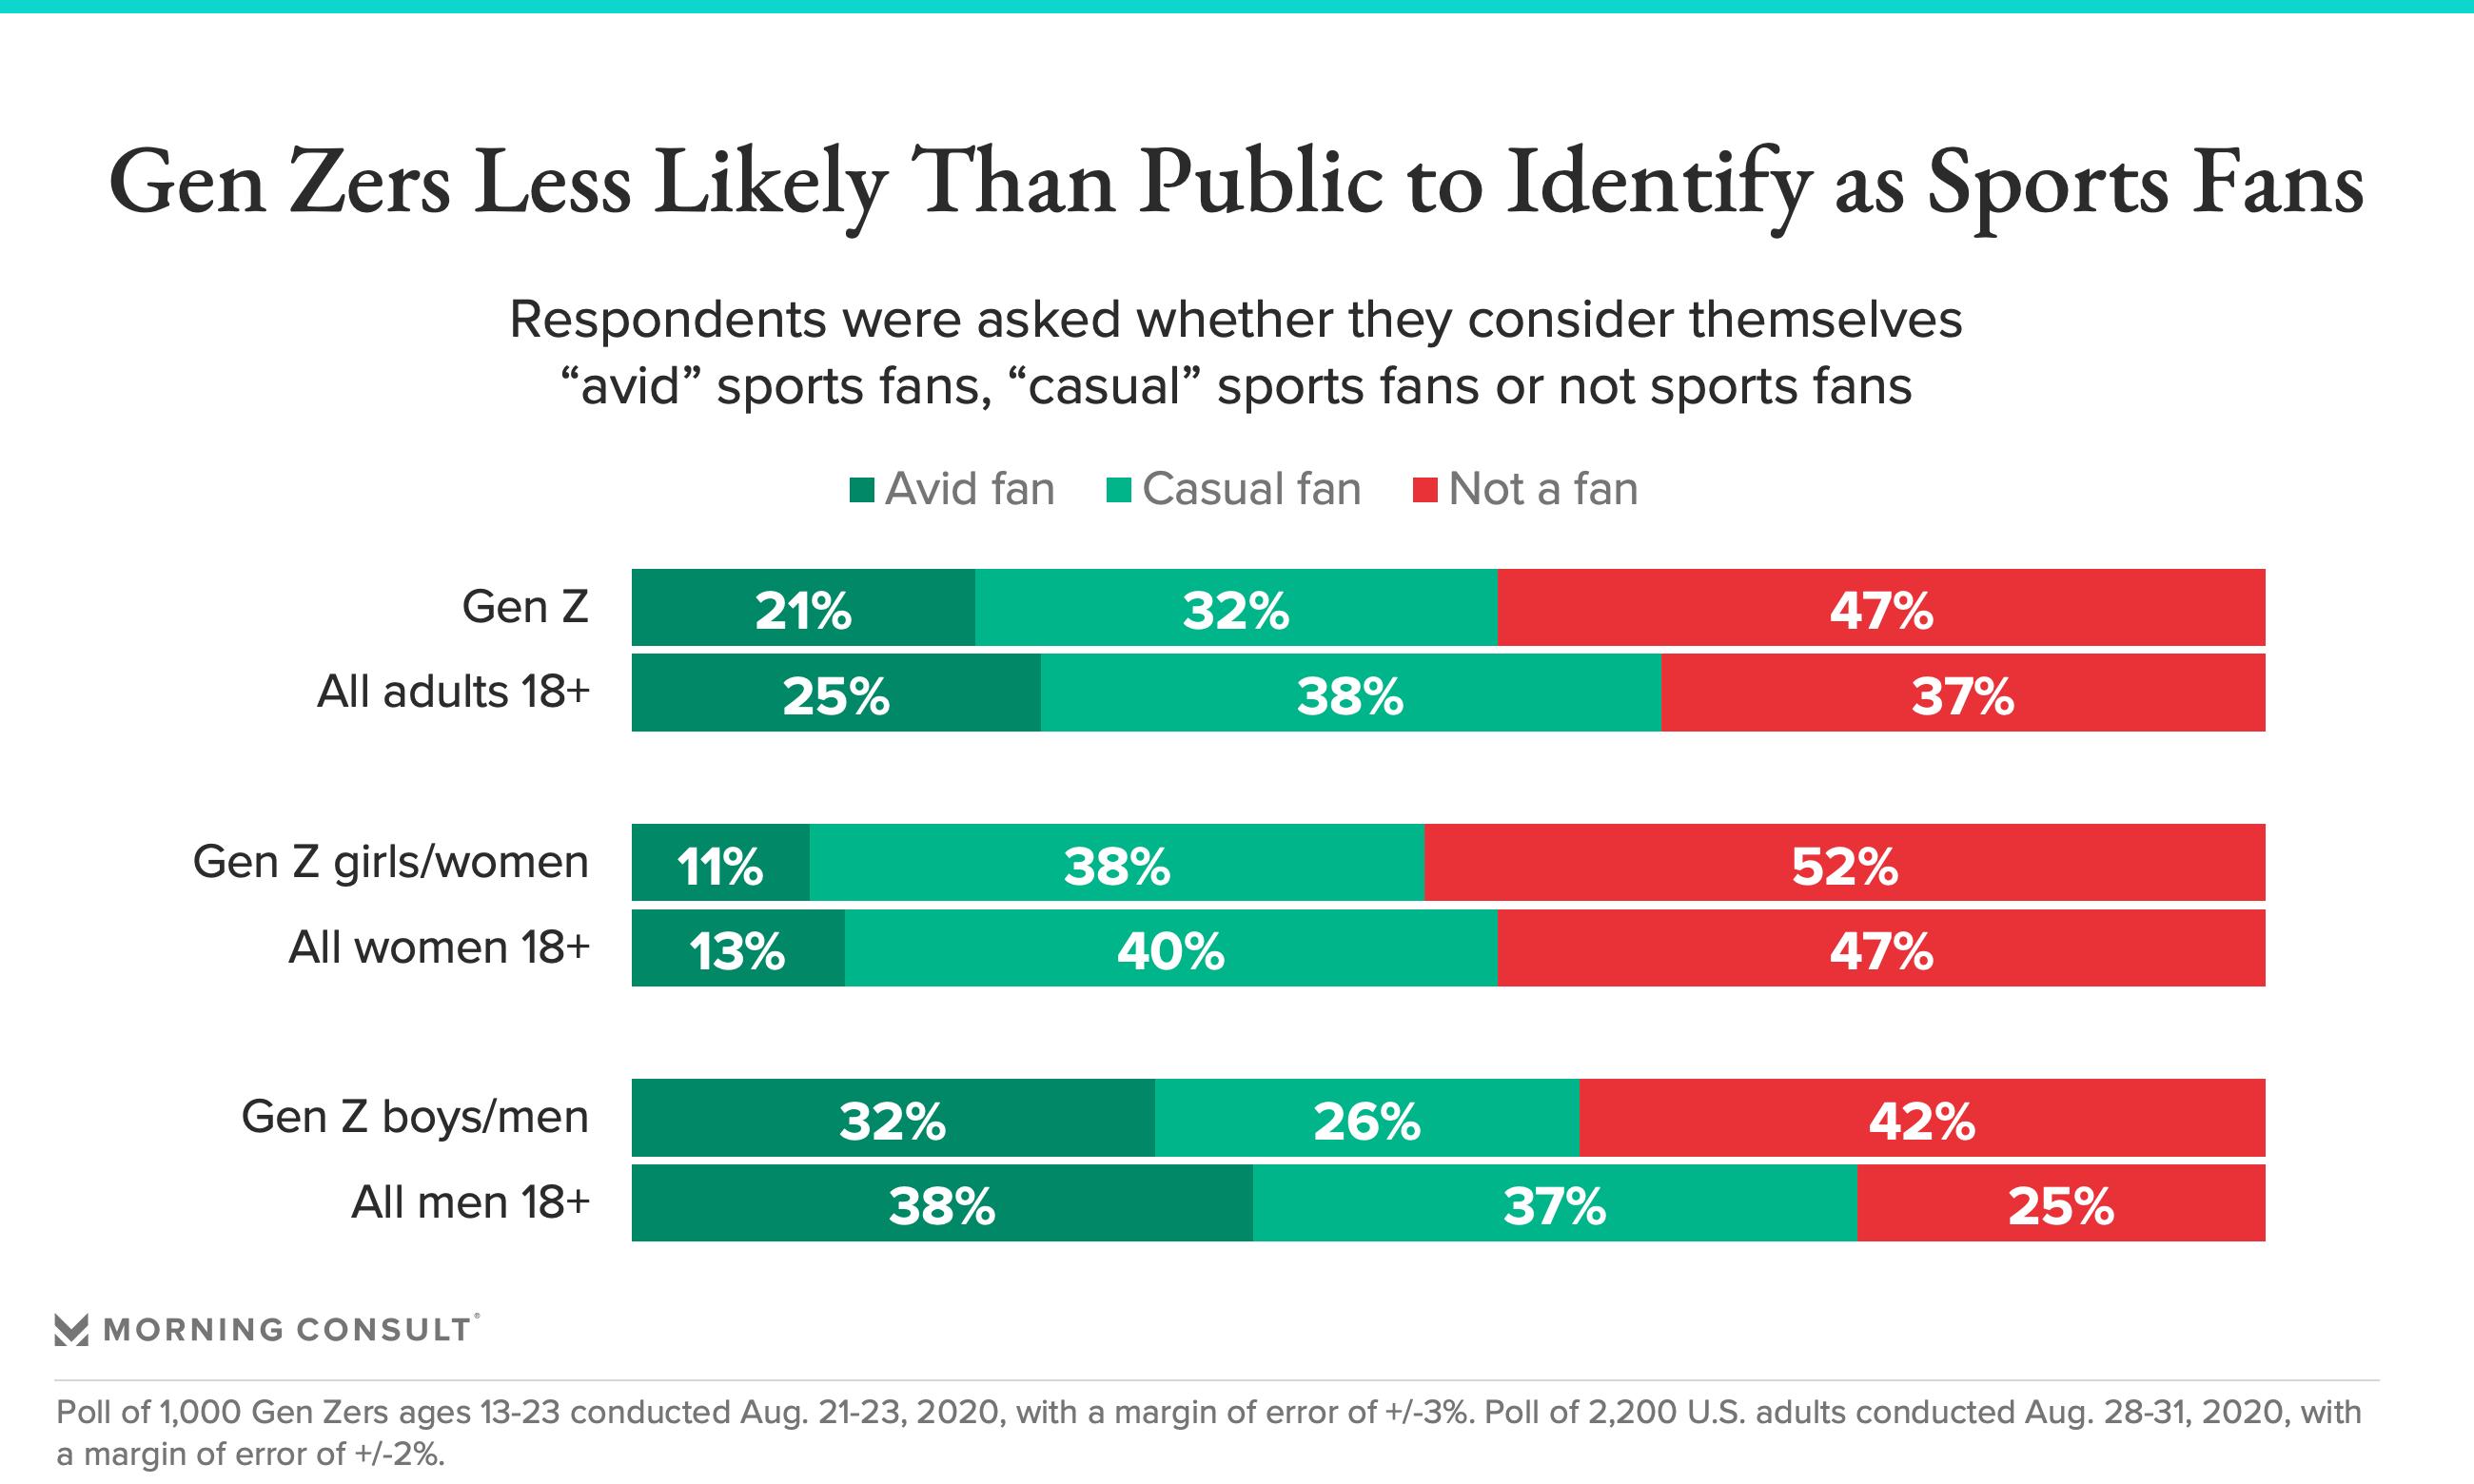 Gen Z less likely to identify as sports fans